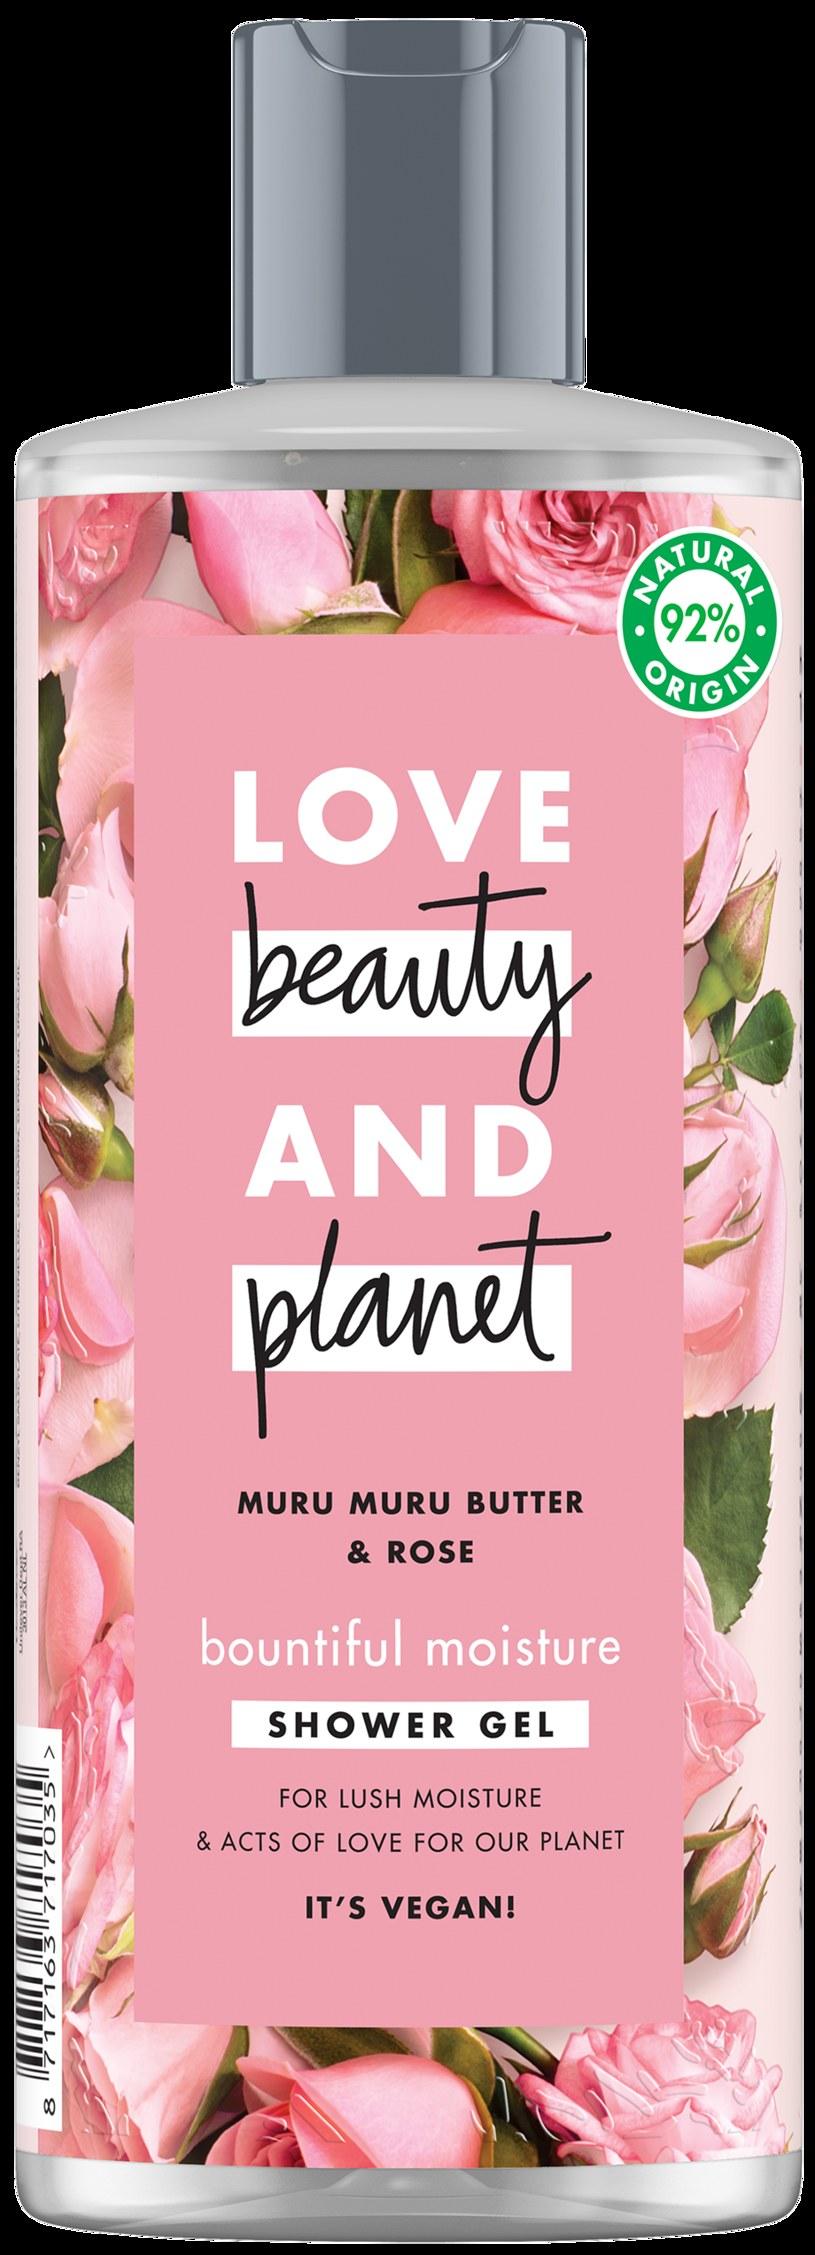 Love Beauty & Planet /INTERIA.PL/materiały prasowe